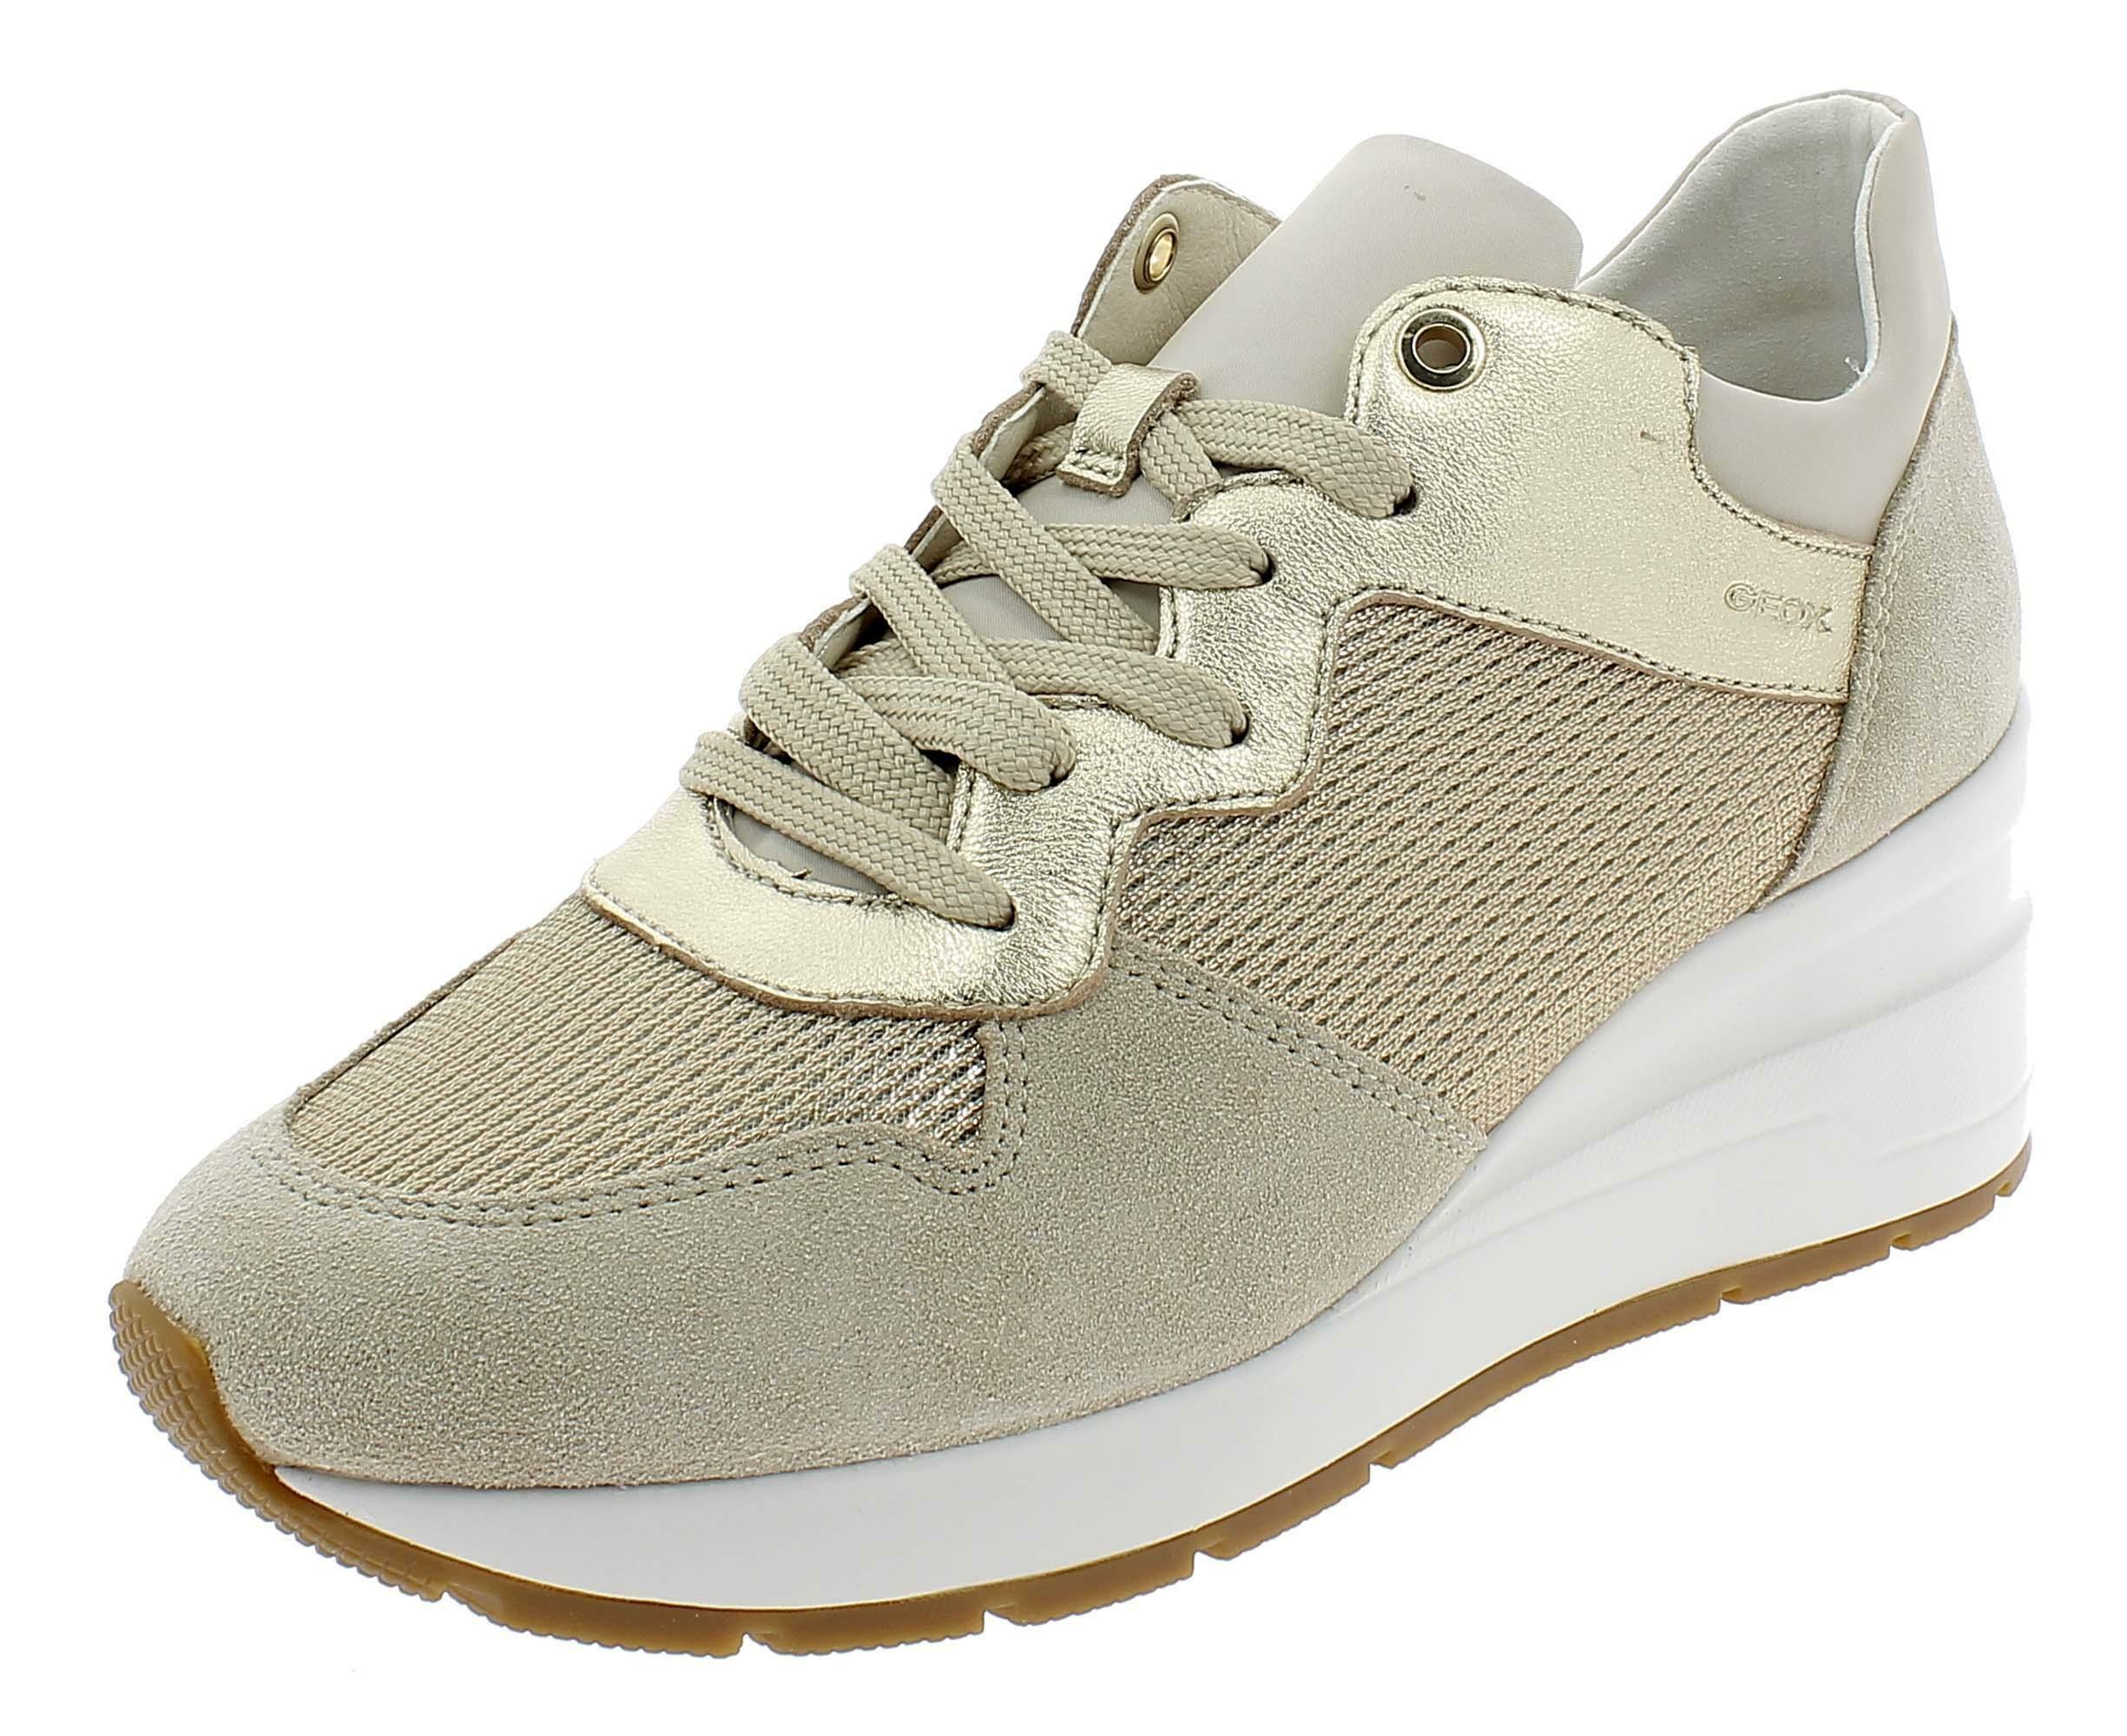 f91fabdf4c Geox d zosma c scarpe sportive donna beige d828lcc0434